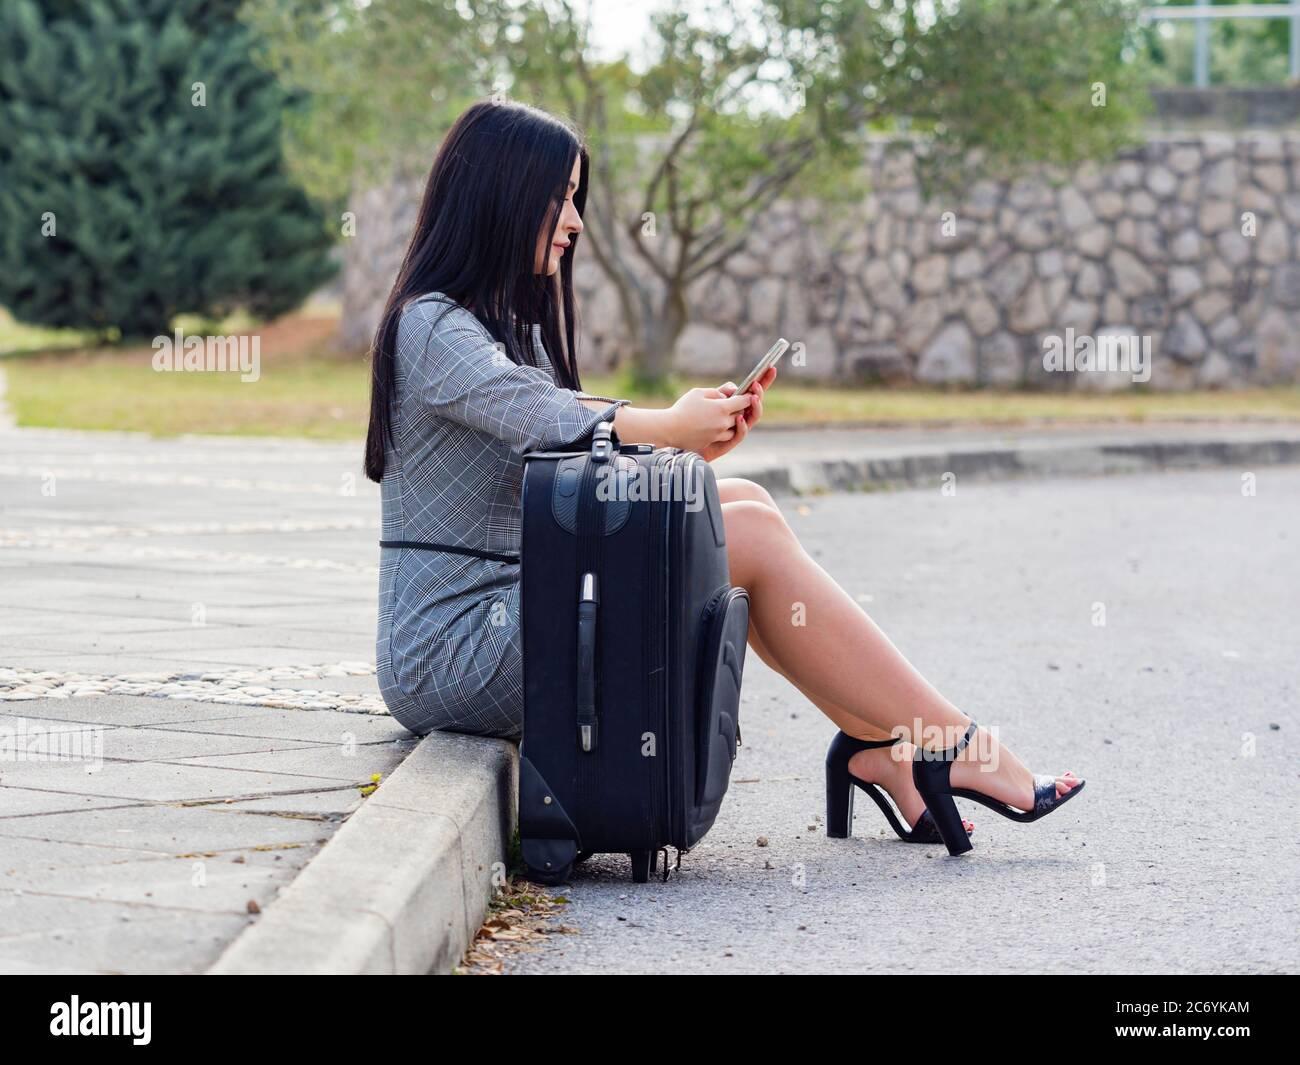 Aka young woman legs heels Stock Photo